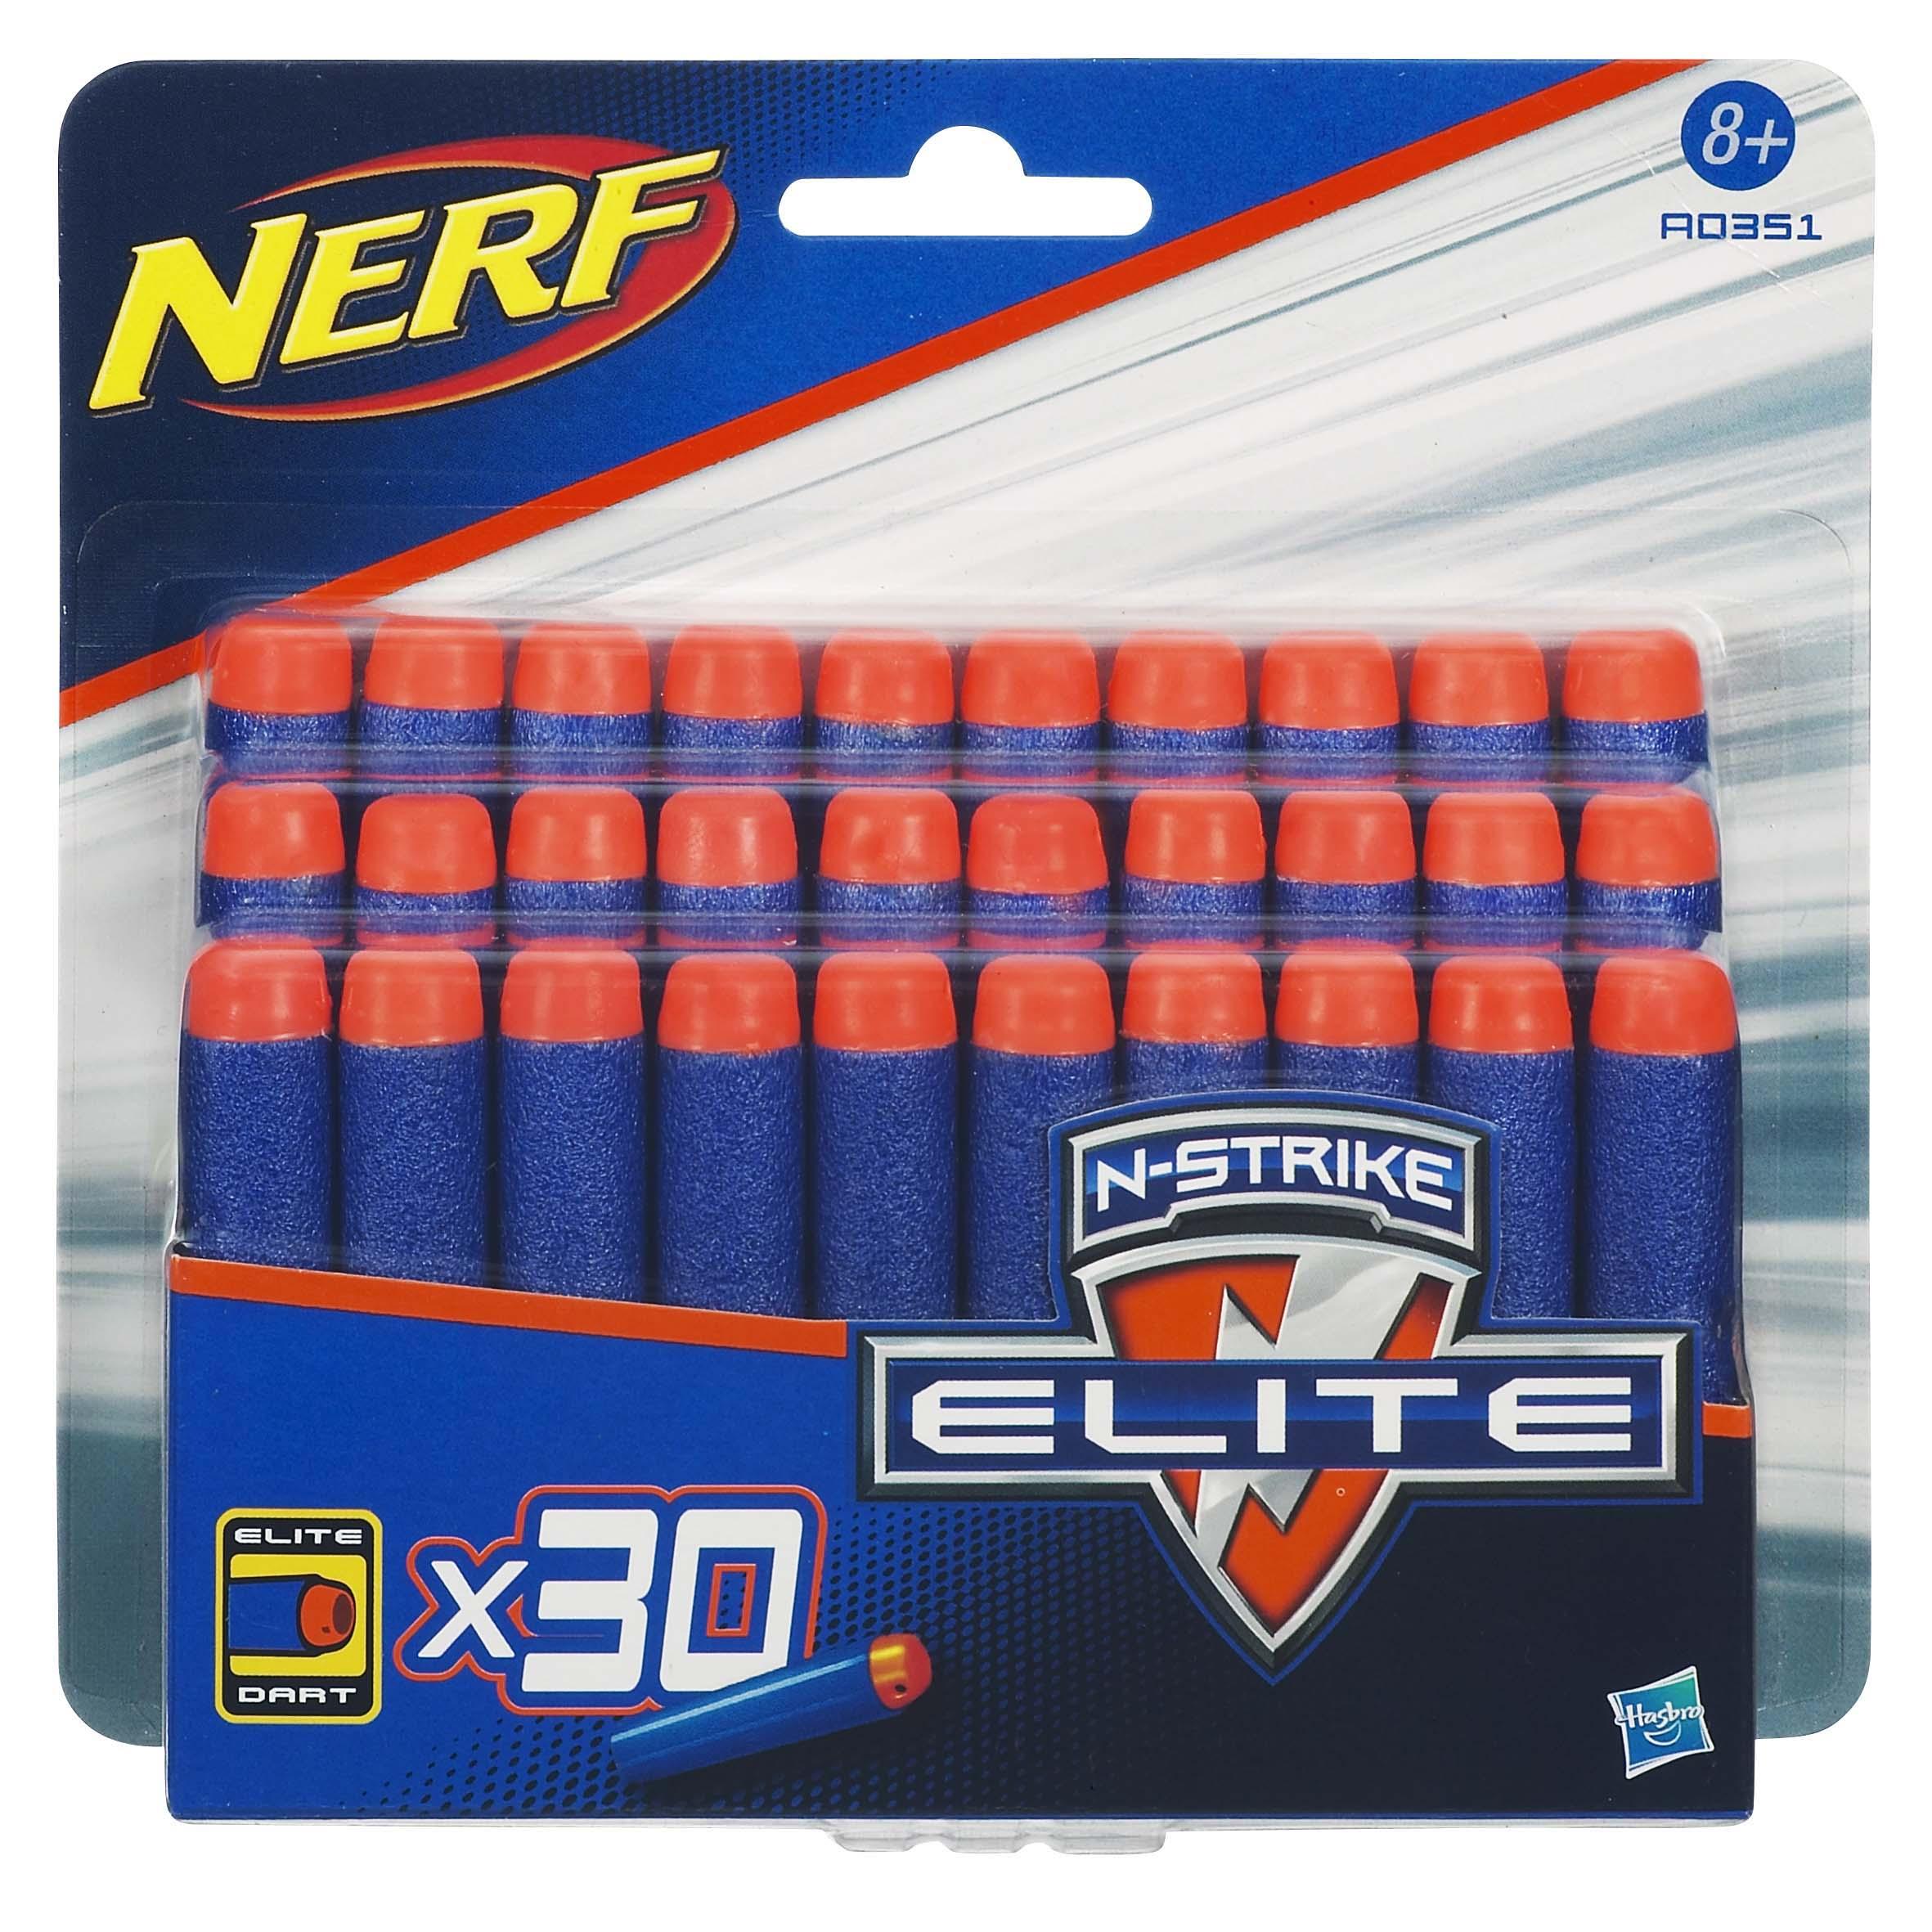 Hasbro Nerf N-Strike Elite Refills 30 Stuks